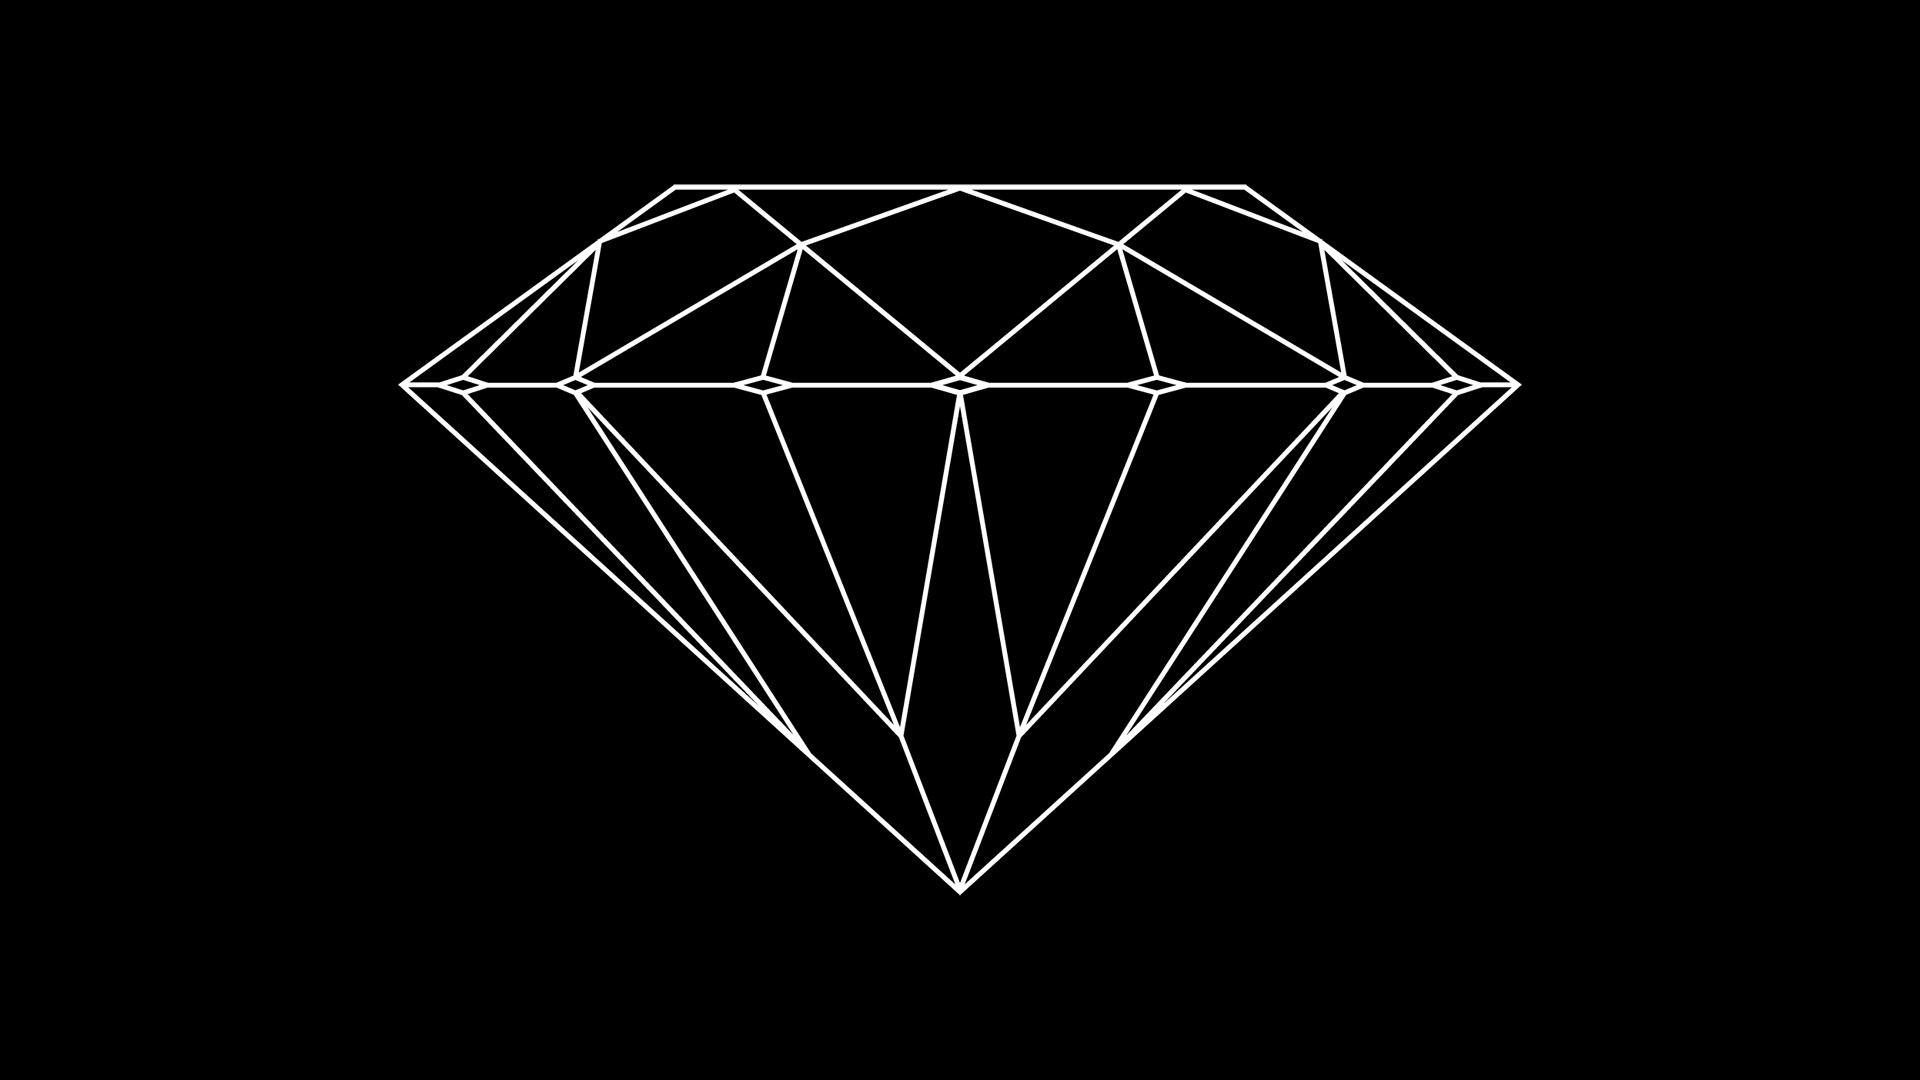 Res: 1920x1080, 17 Best ideas about Diamond Wallpaper on Pinterest   Black